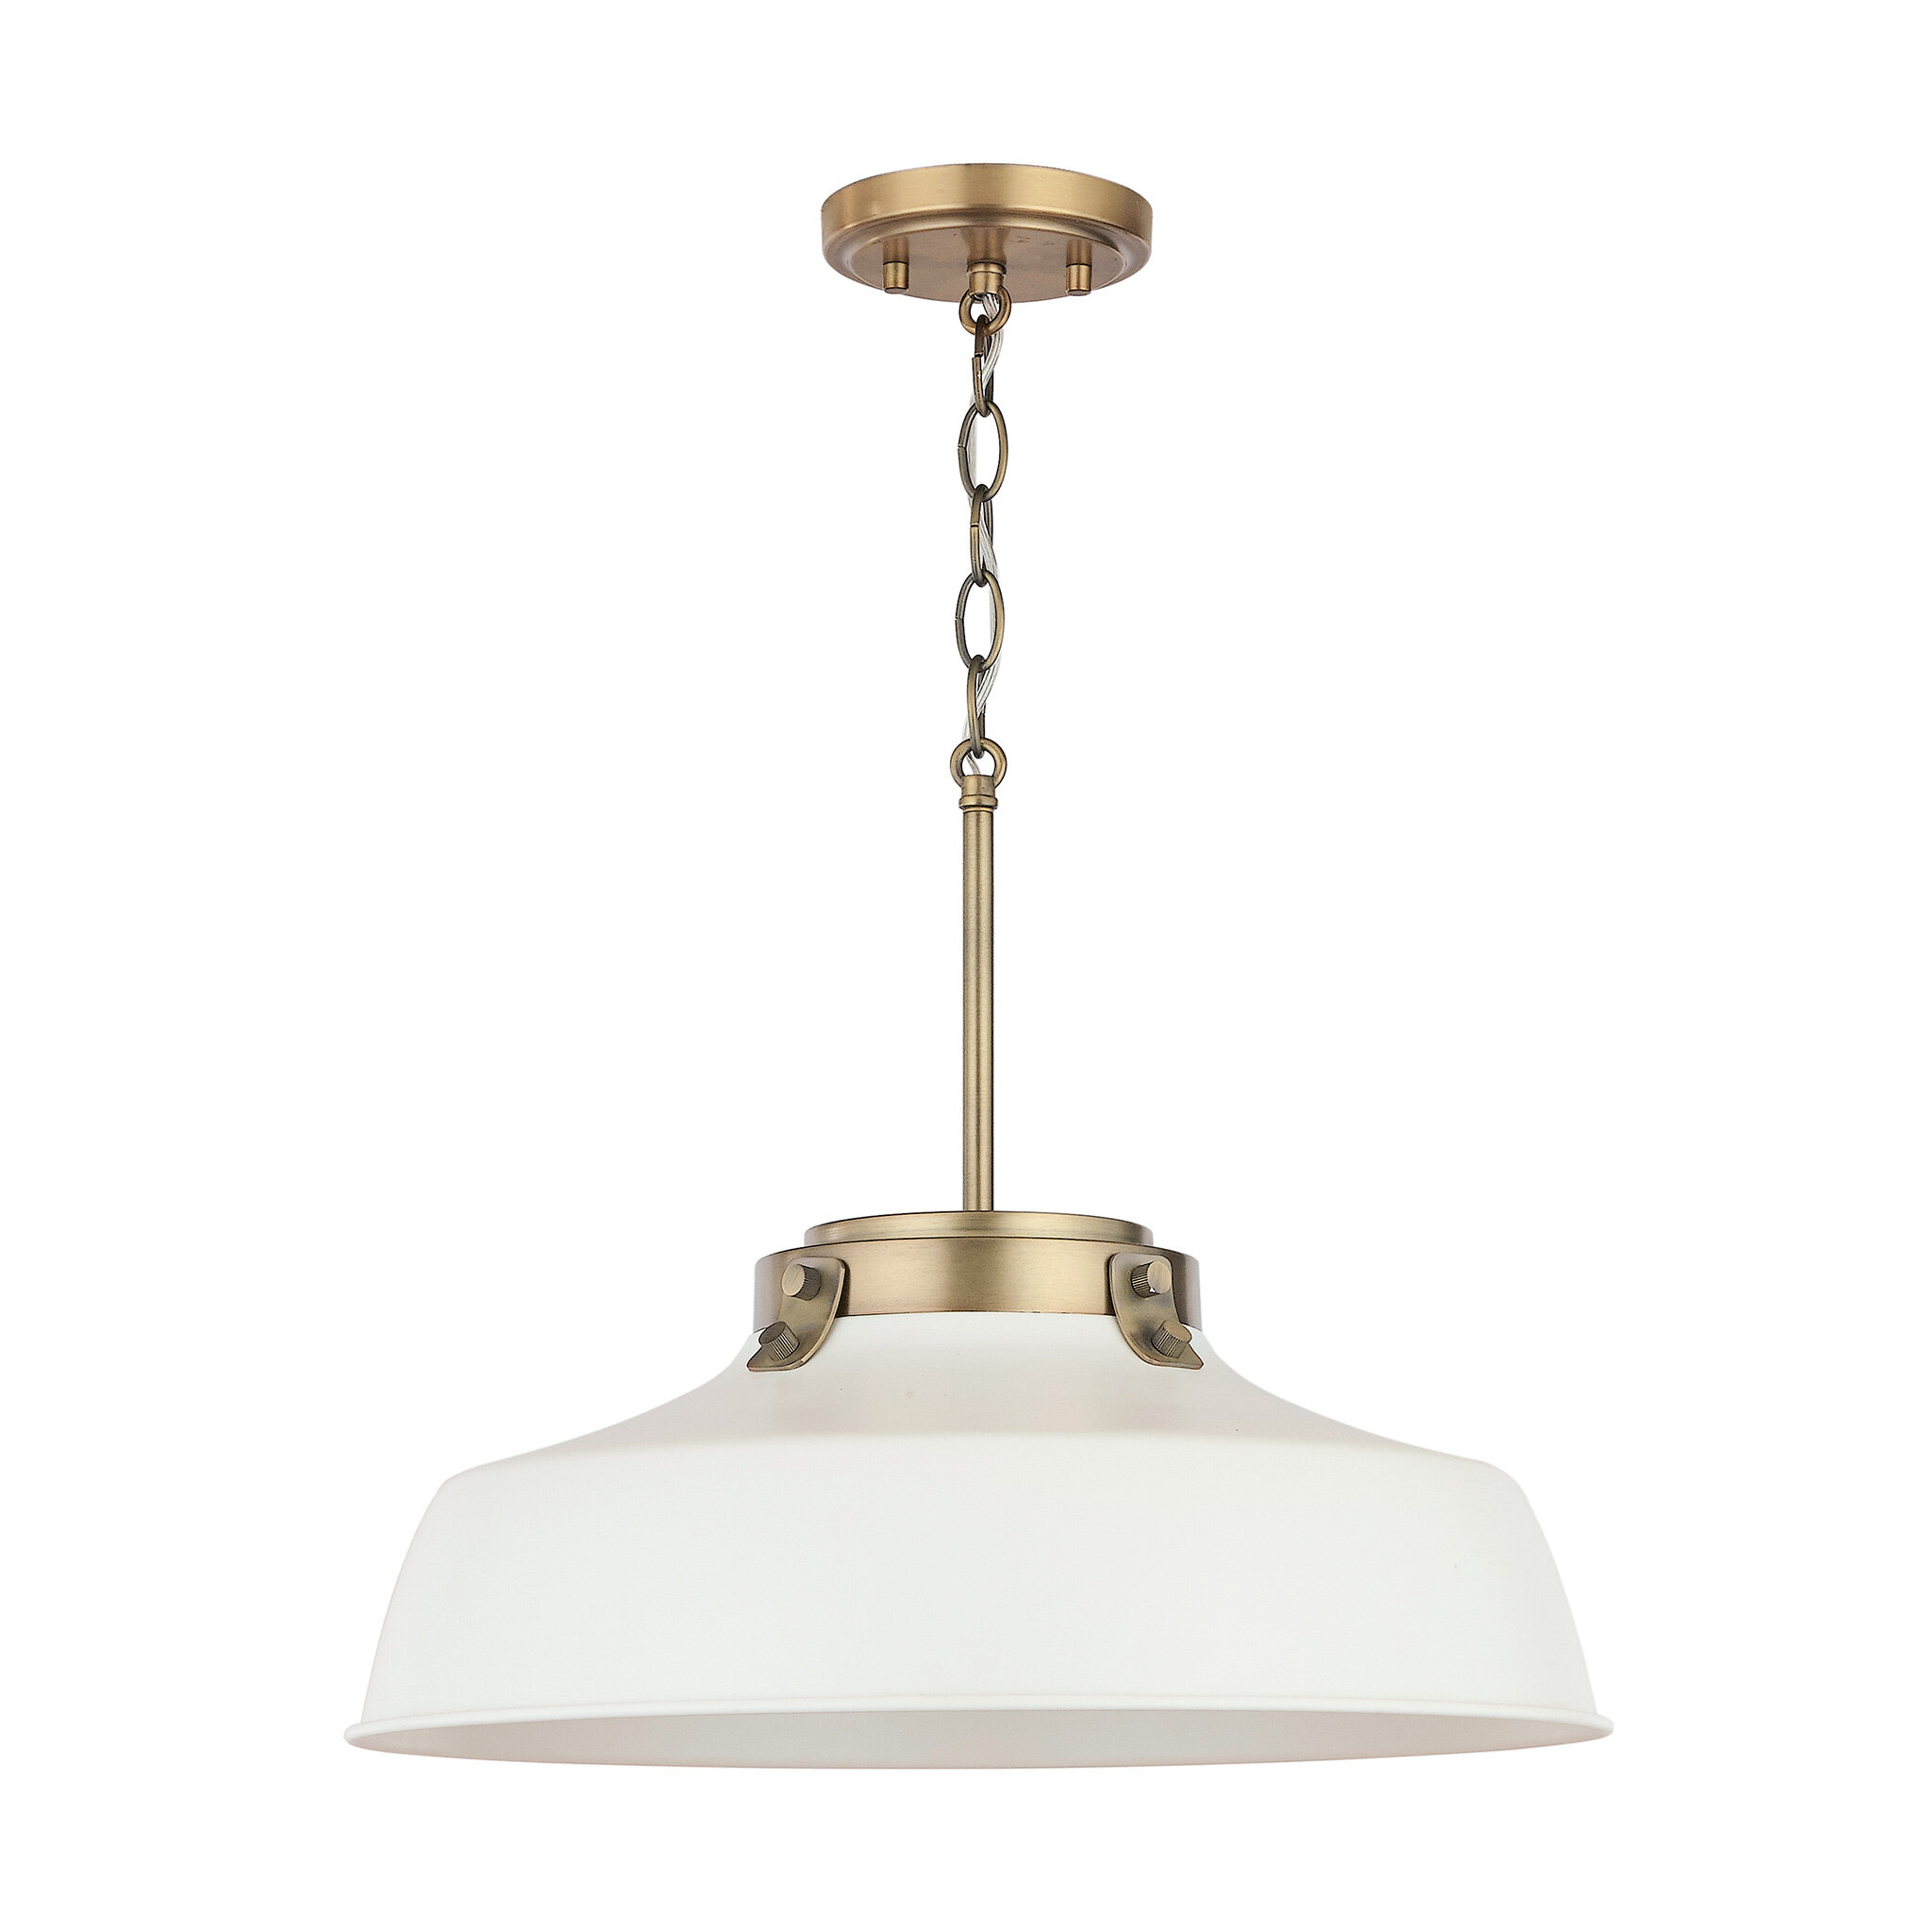 1 Light Single Dome Pendant With Regard To Knoxville 1 Light Single Teardrop Pendants (Gallery 9 of 30)